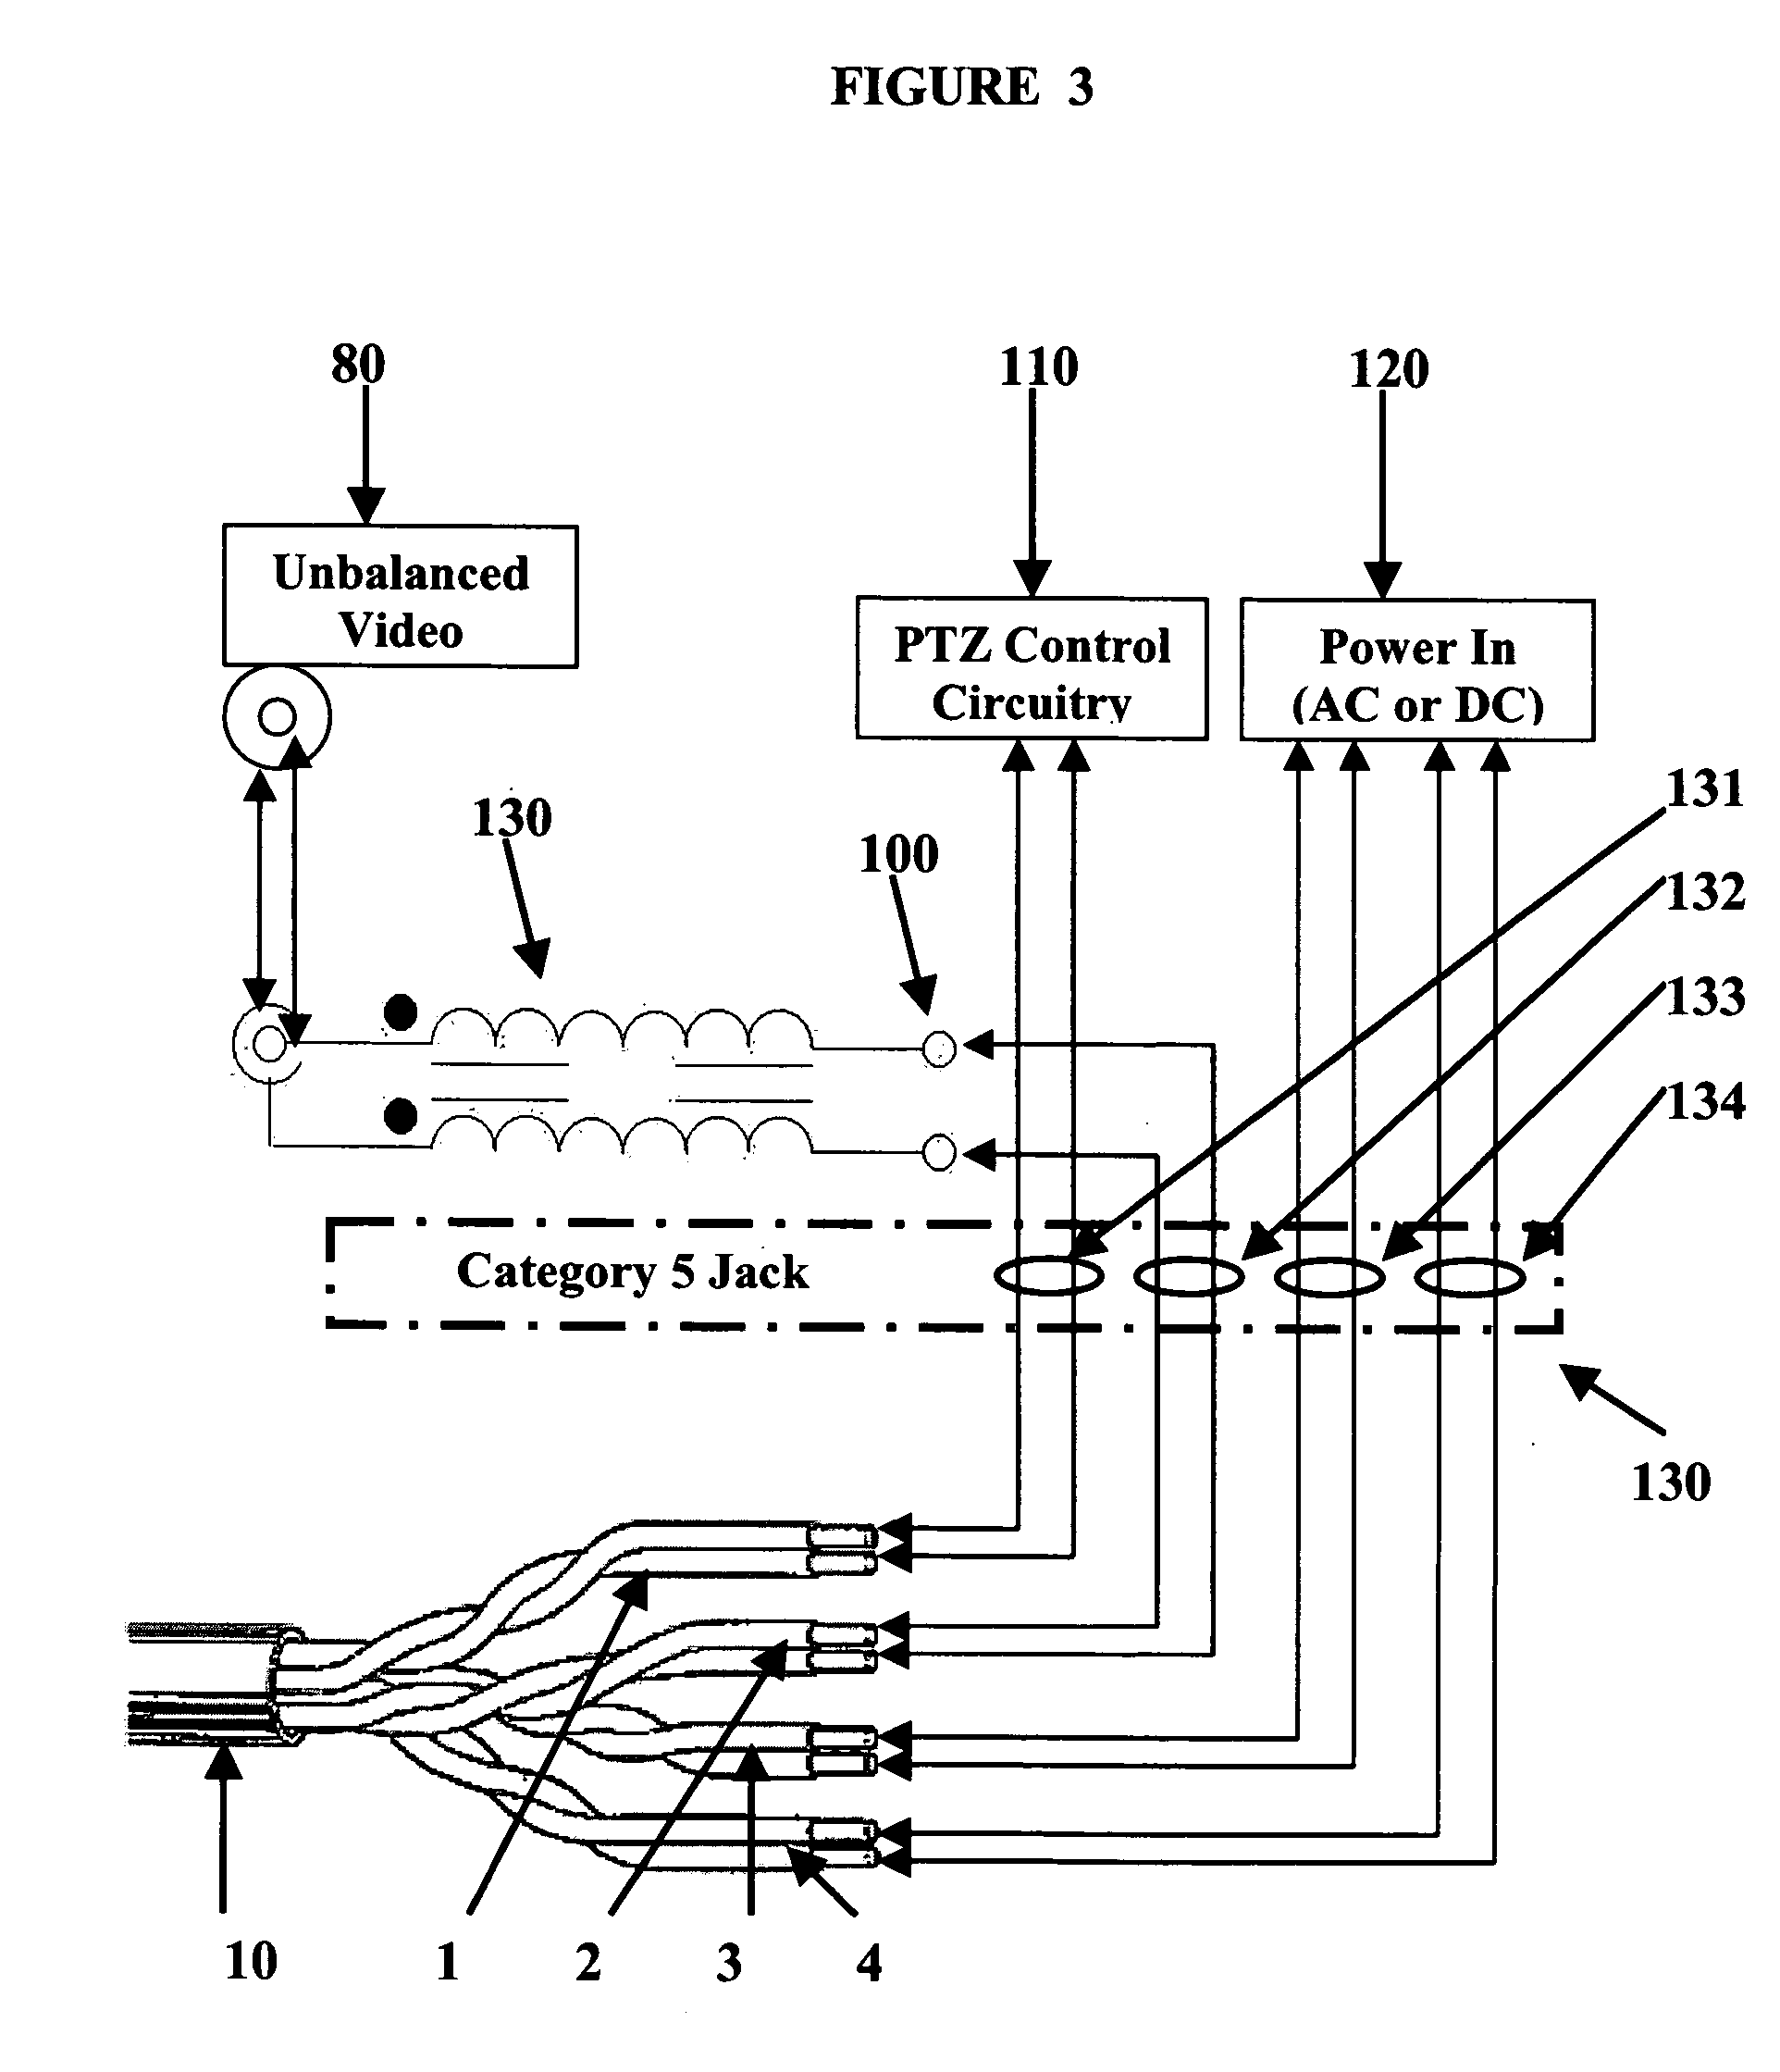 Power jack wiring diagram